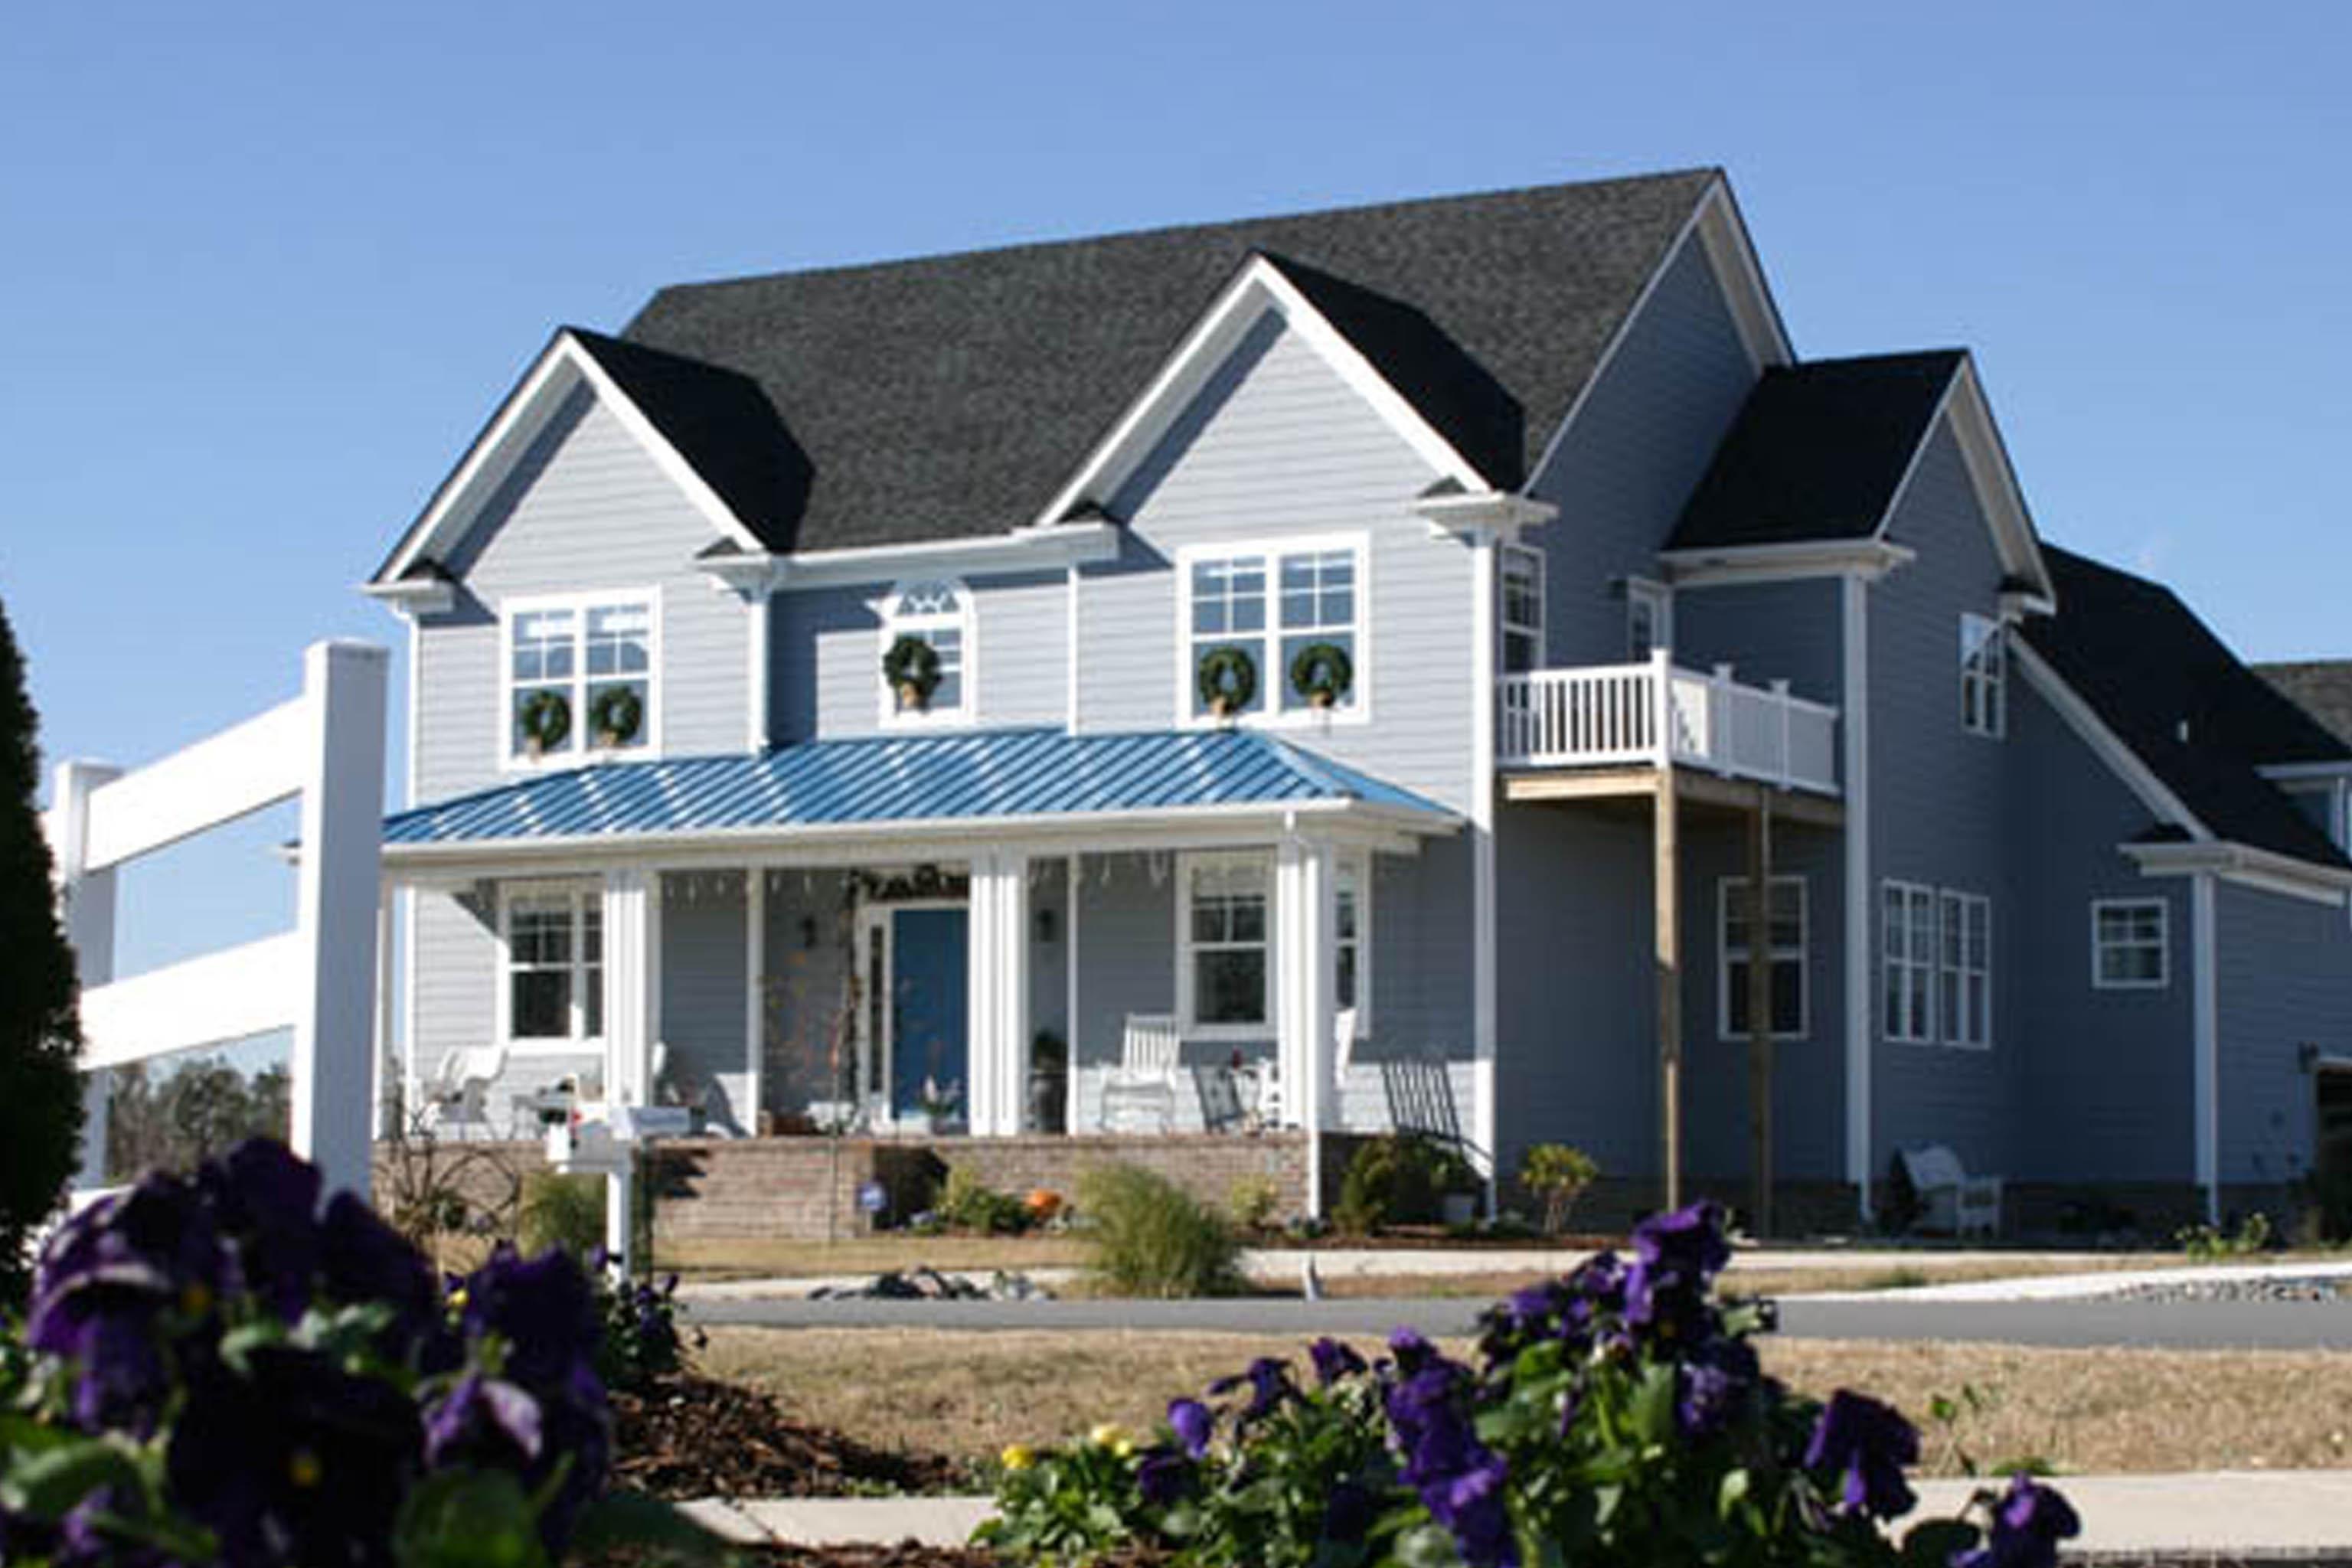 House Plan 179 - McKeon